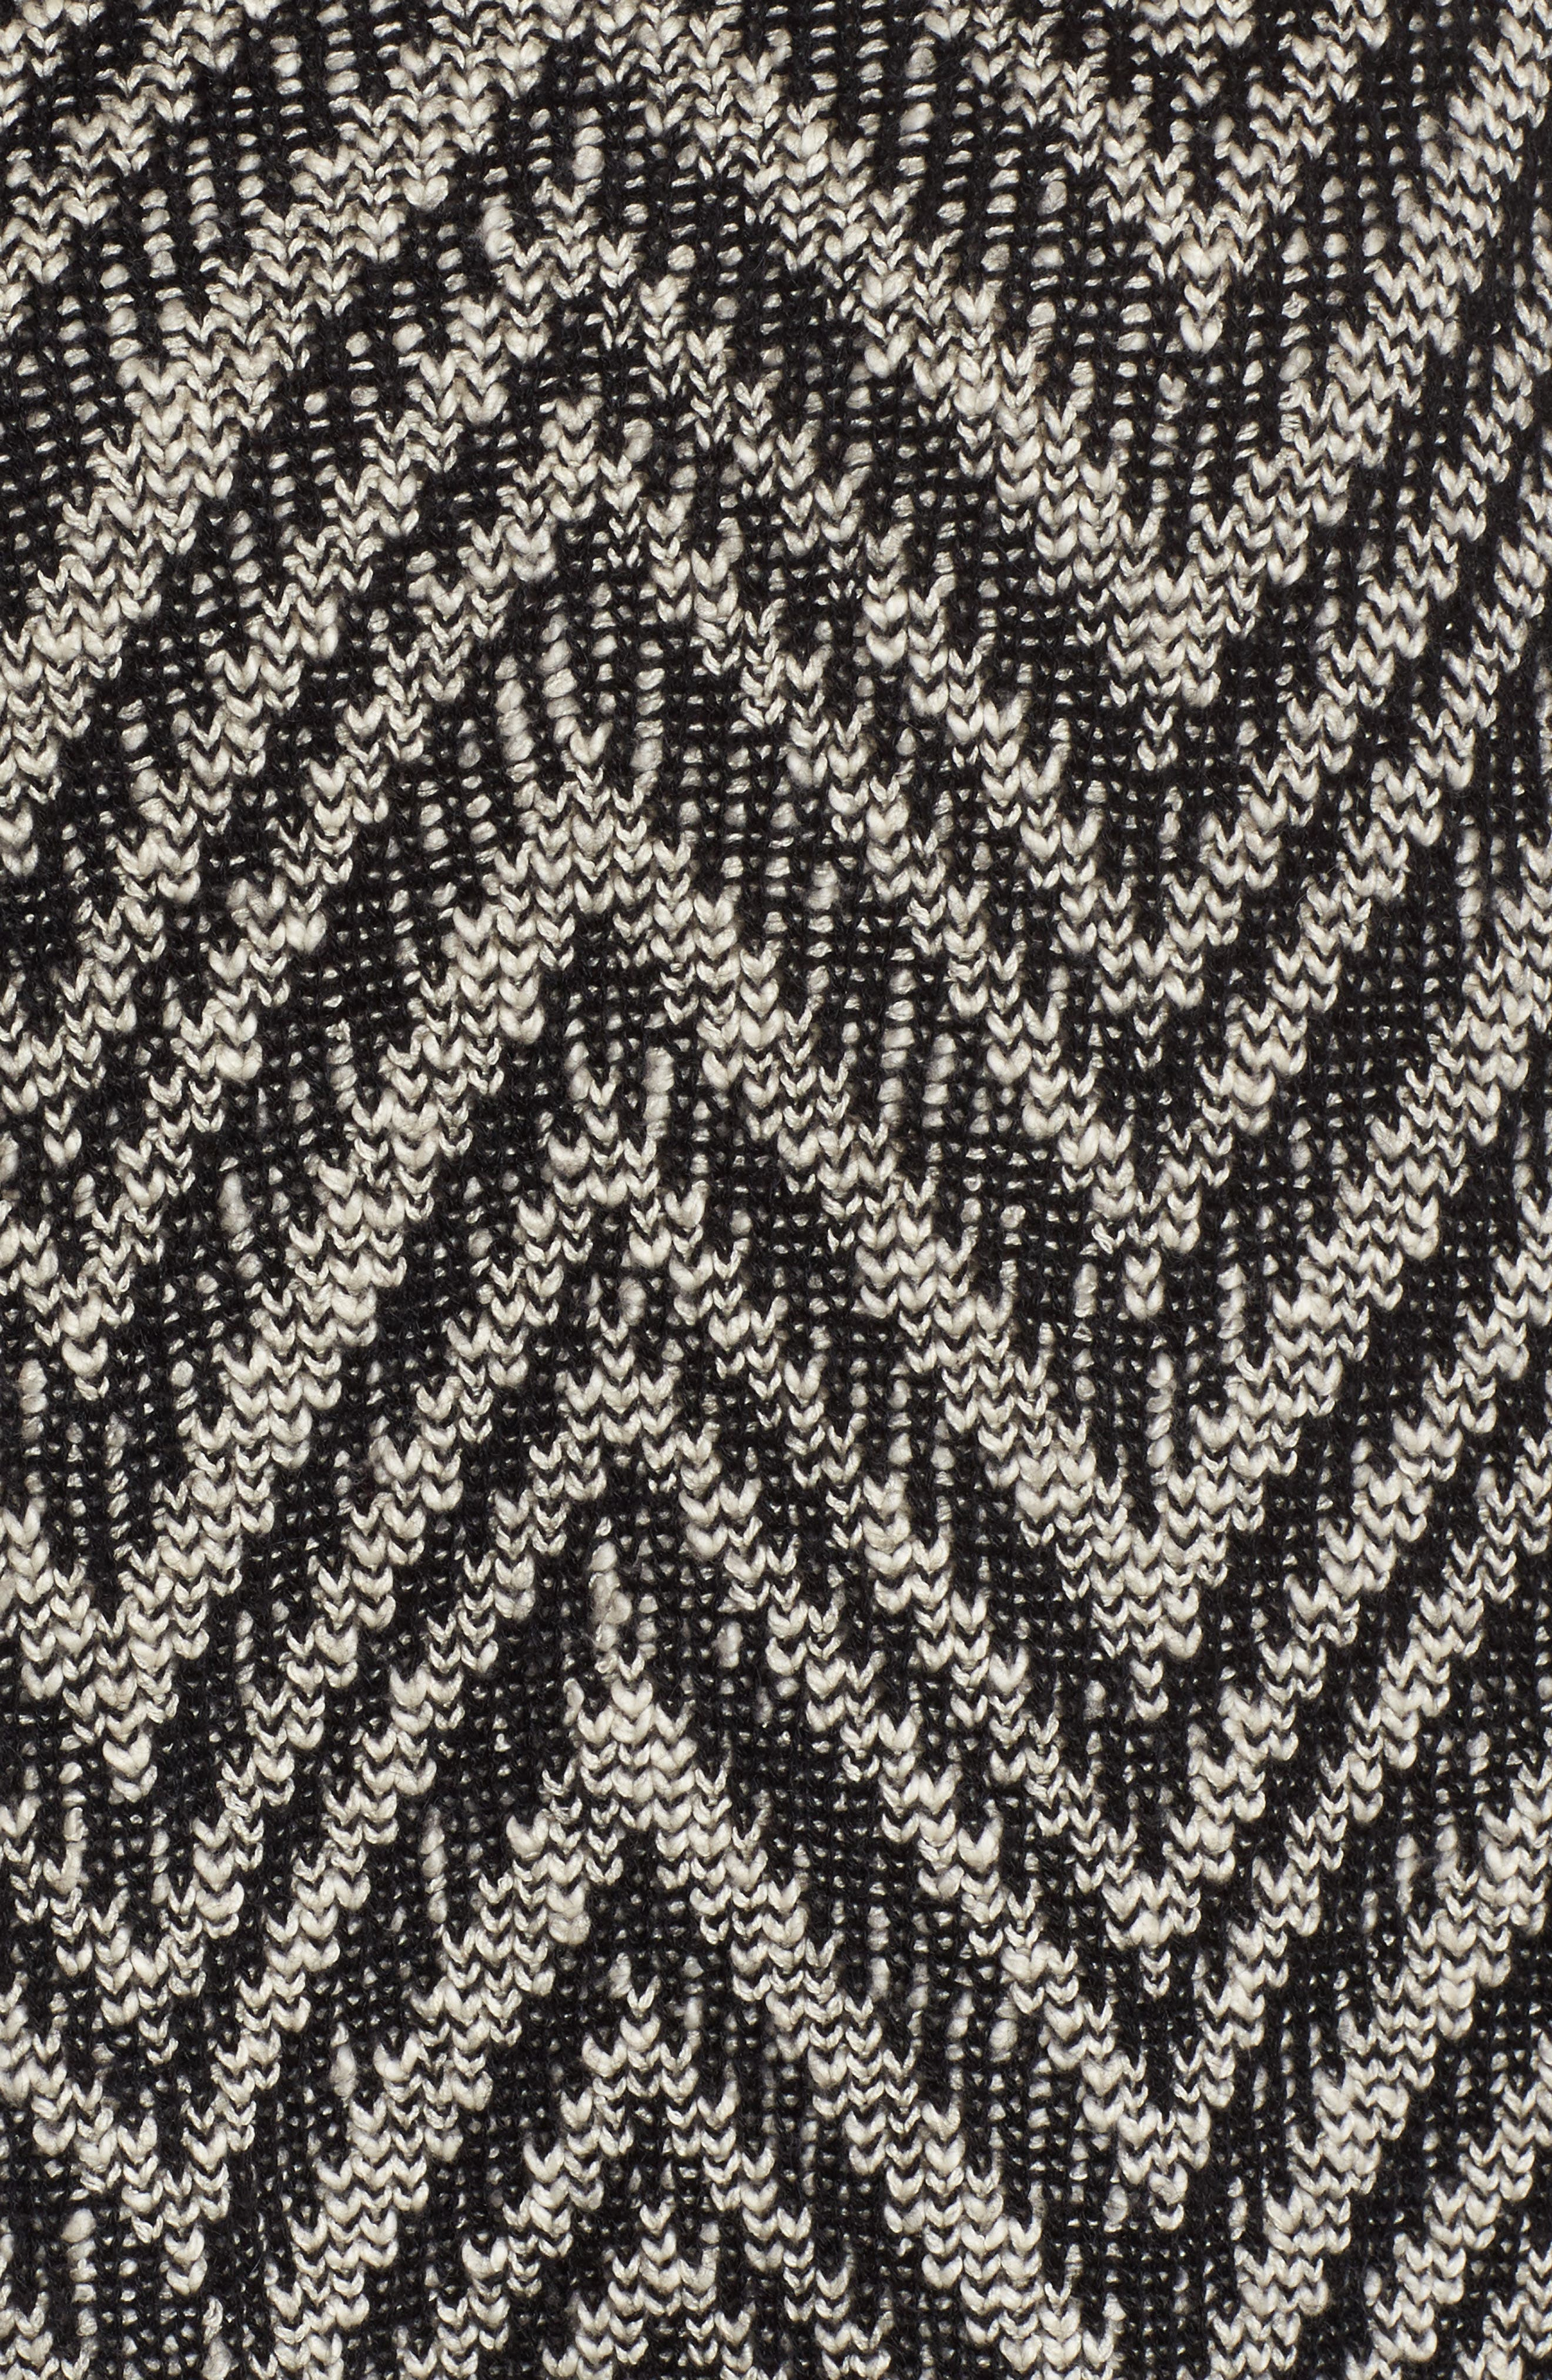 Zigzag Organic Cotton & Alpaca Tunic Sweater,                             Alternate thumbnail 5, color,                             Black/ Soft White